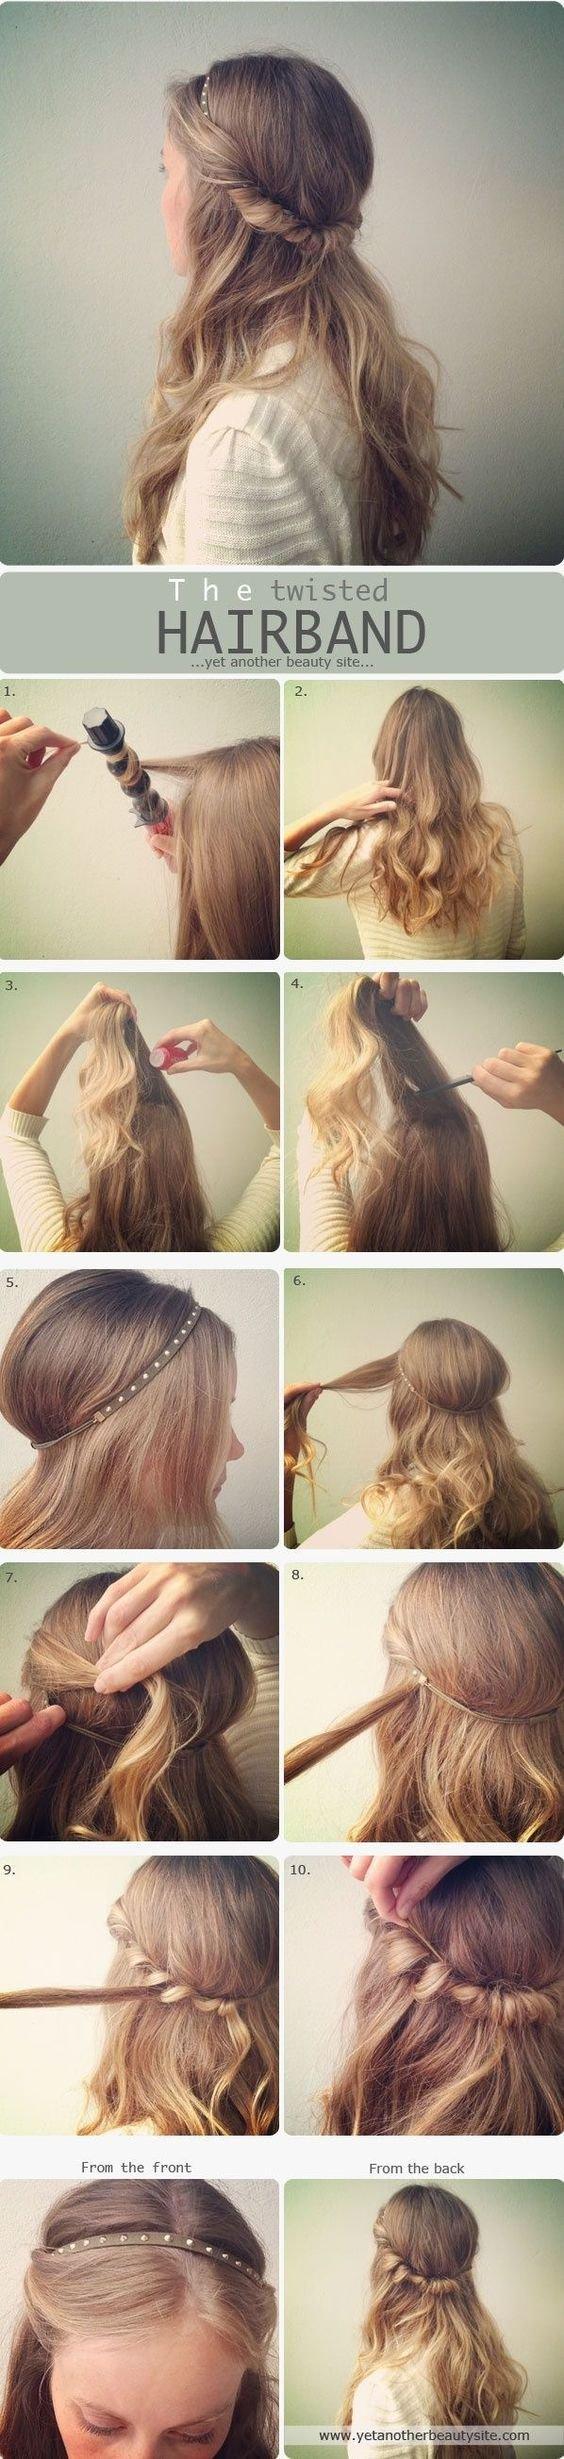 hair, forehead, fur, hair coloring, jaw,